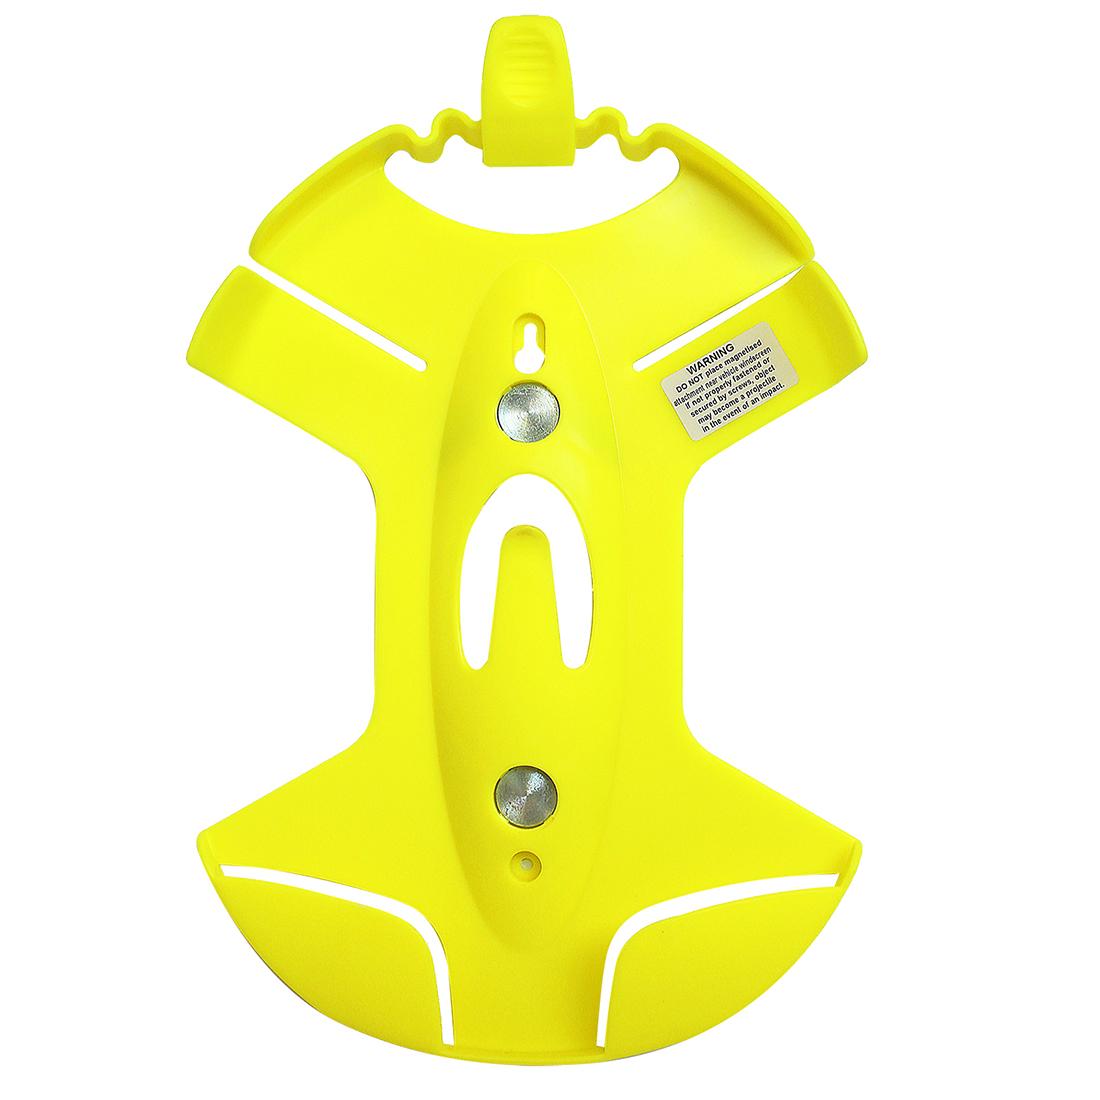 Helmet Holder, Yellow  R/Fit